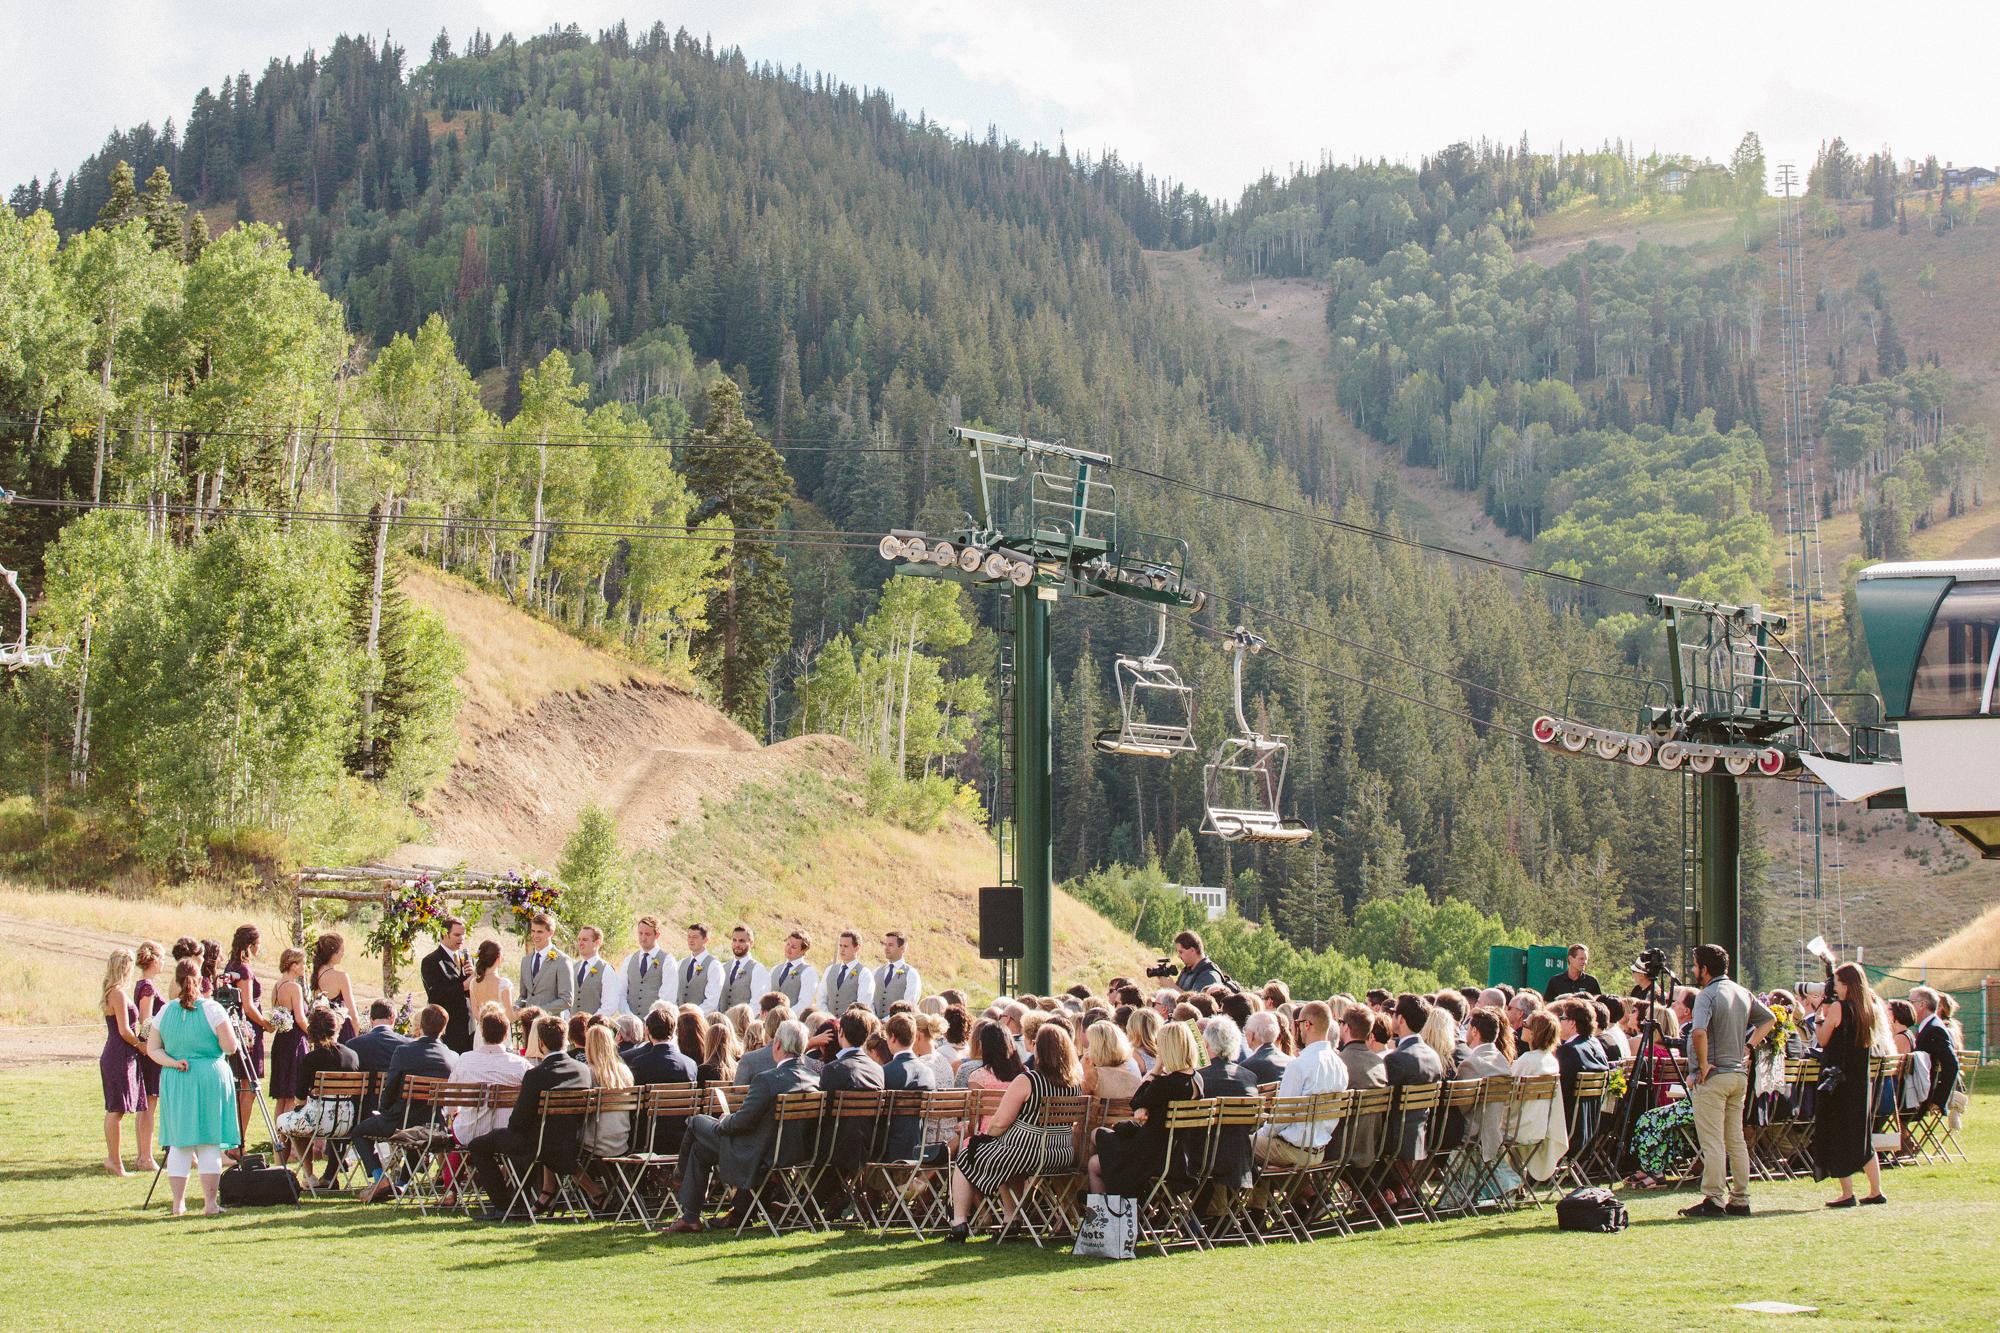 empire-lodge-deer-valley-wedding-12.jpg